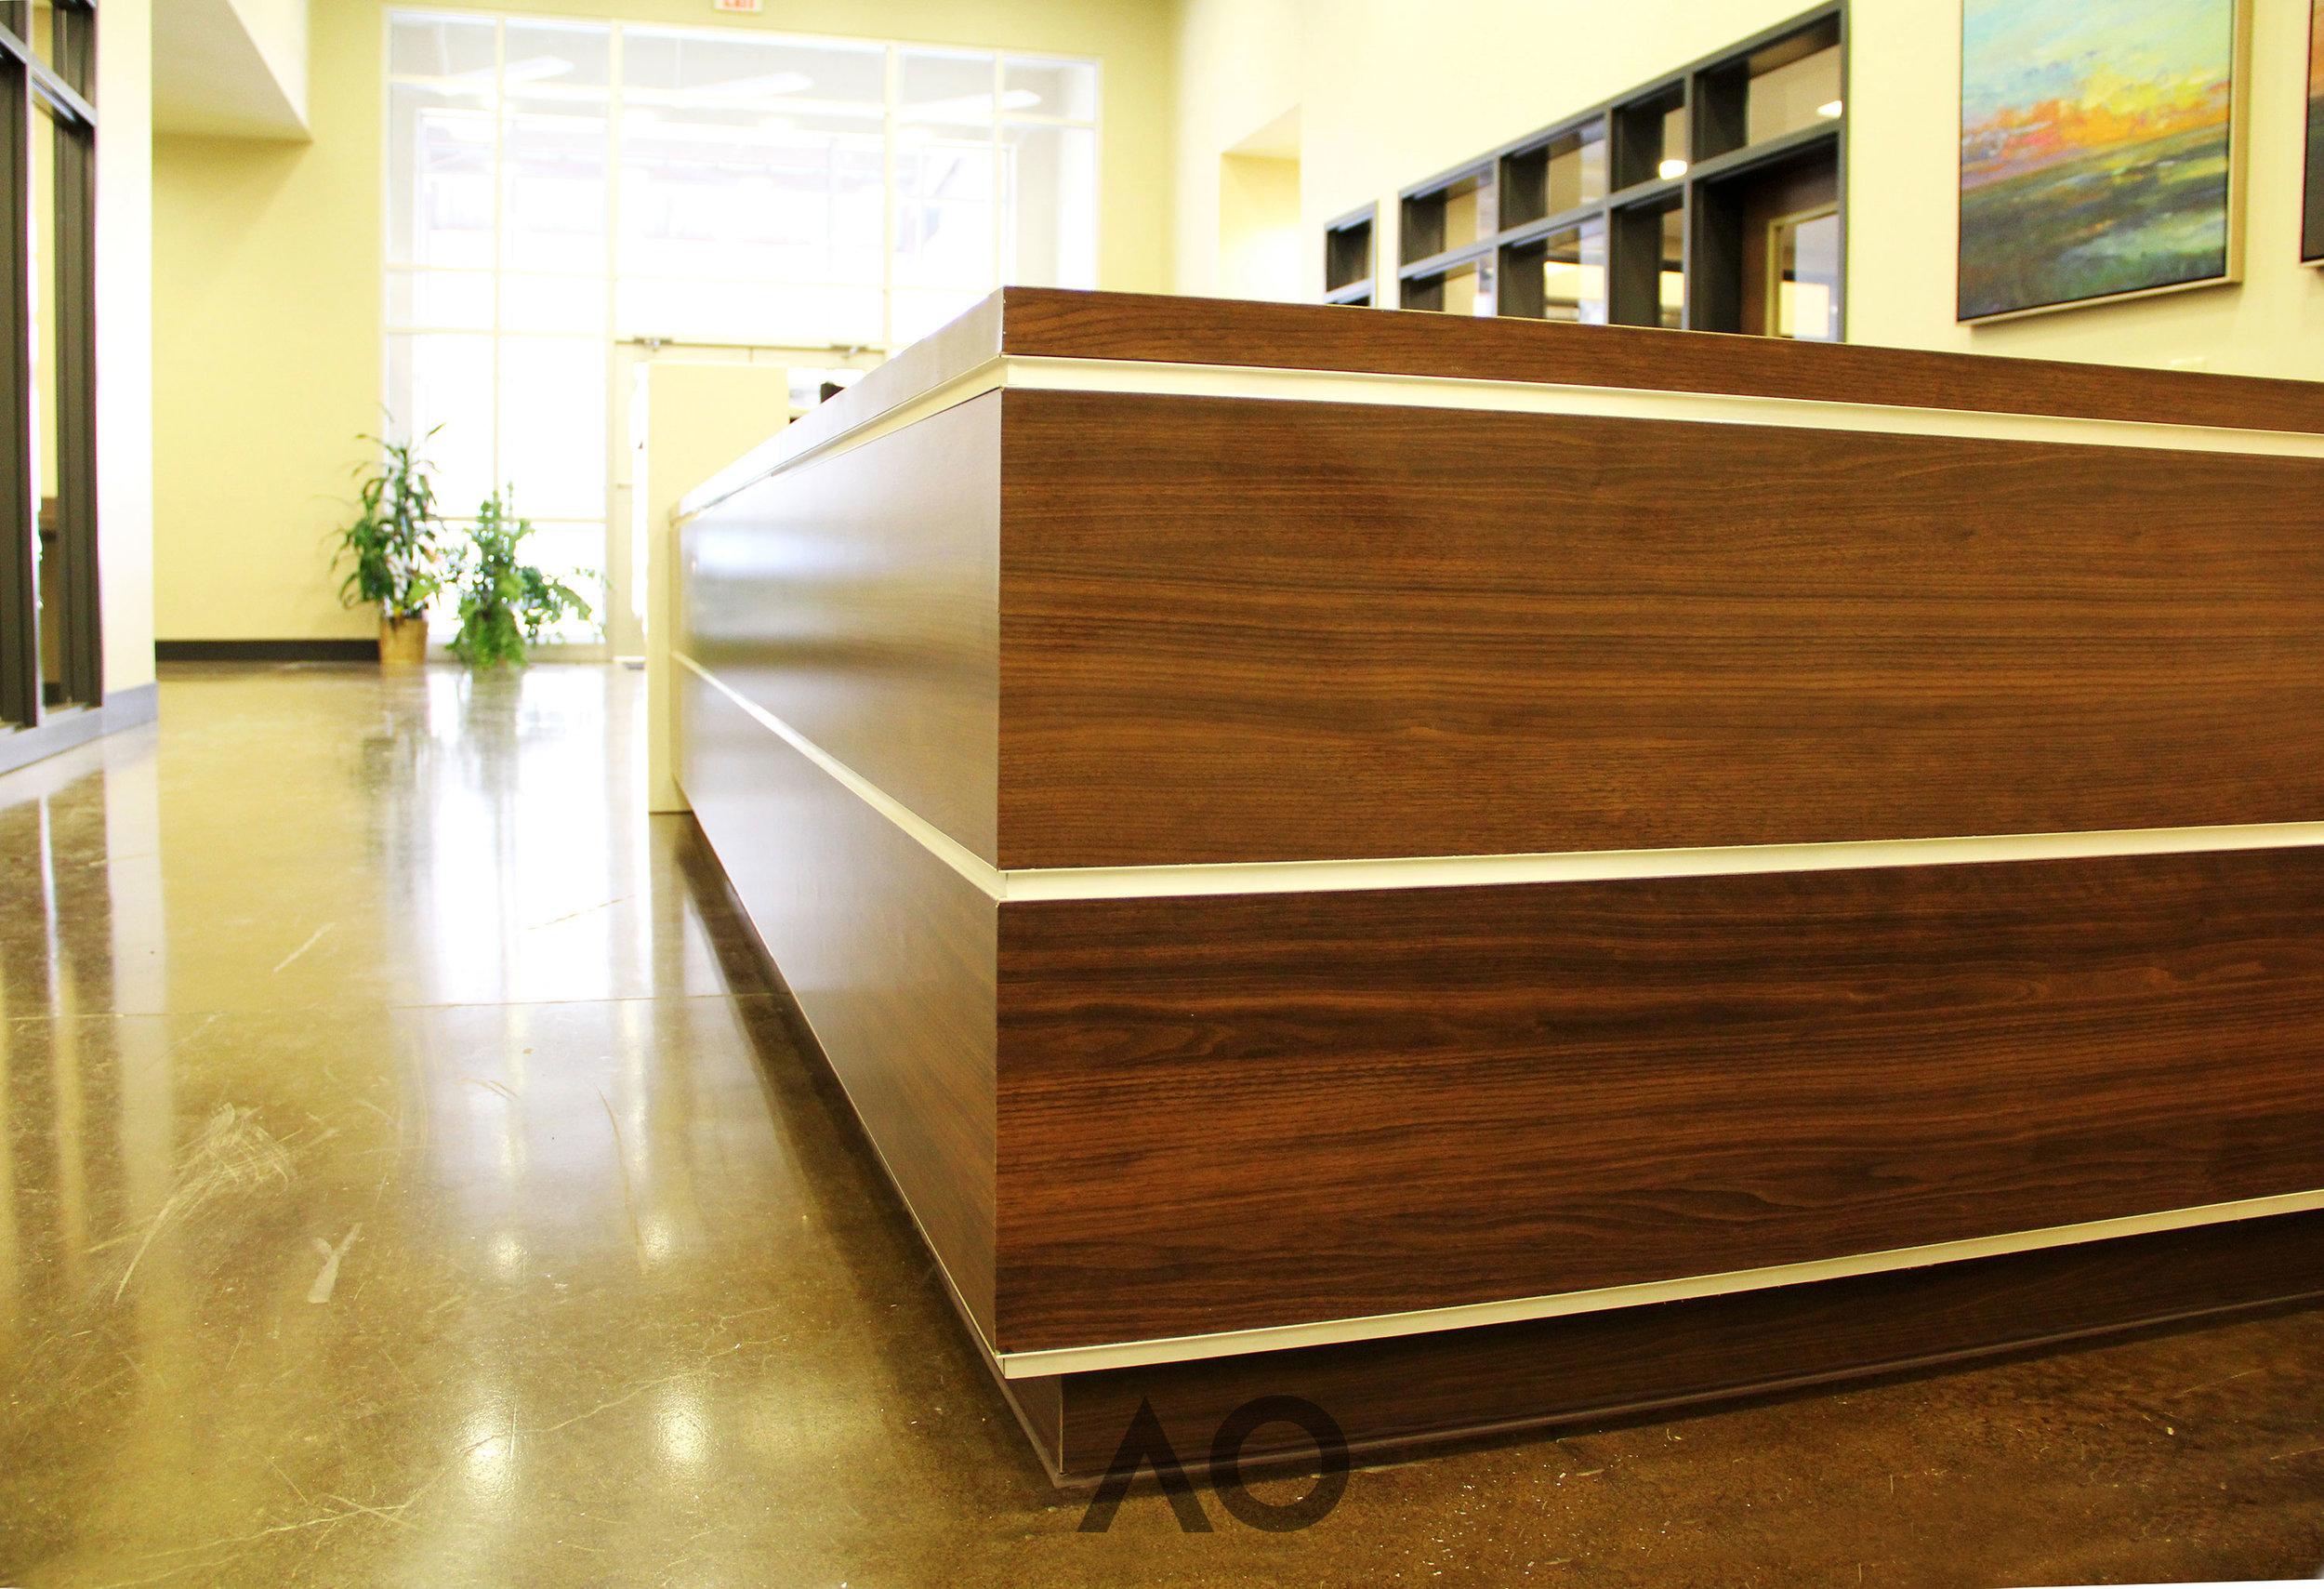 Architect-One-Bettis-3.jpg